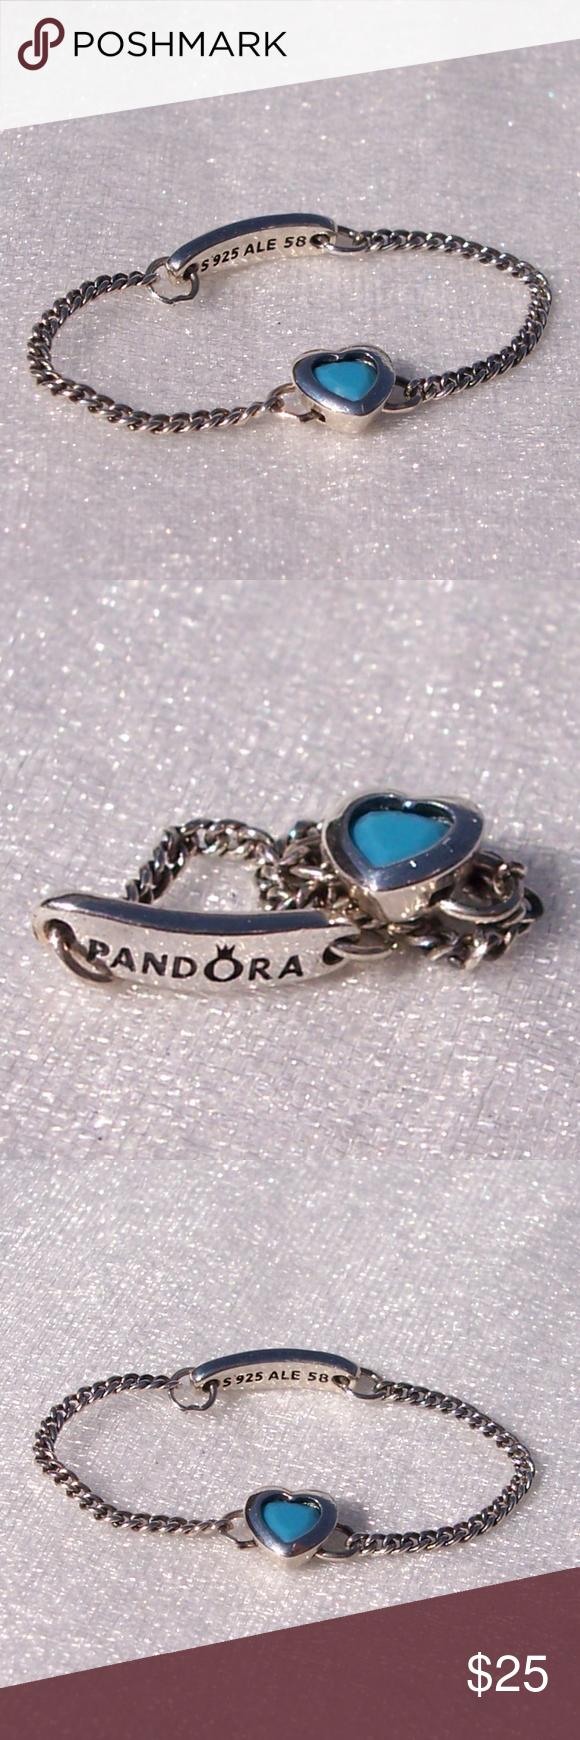 57062df65 PANDORA Ring Spirited Heart Blue Crystal Sterling A NEW Pandora Spirited  Heart Blue Crystal sterling silver cyan chain ring. Pandora Jewelry Rings